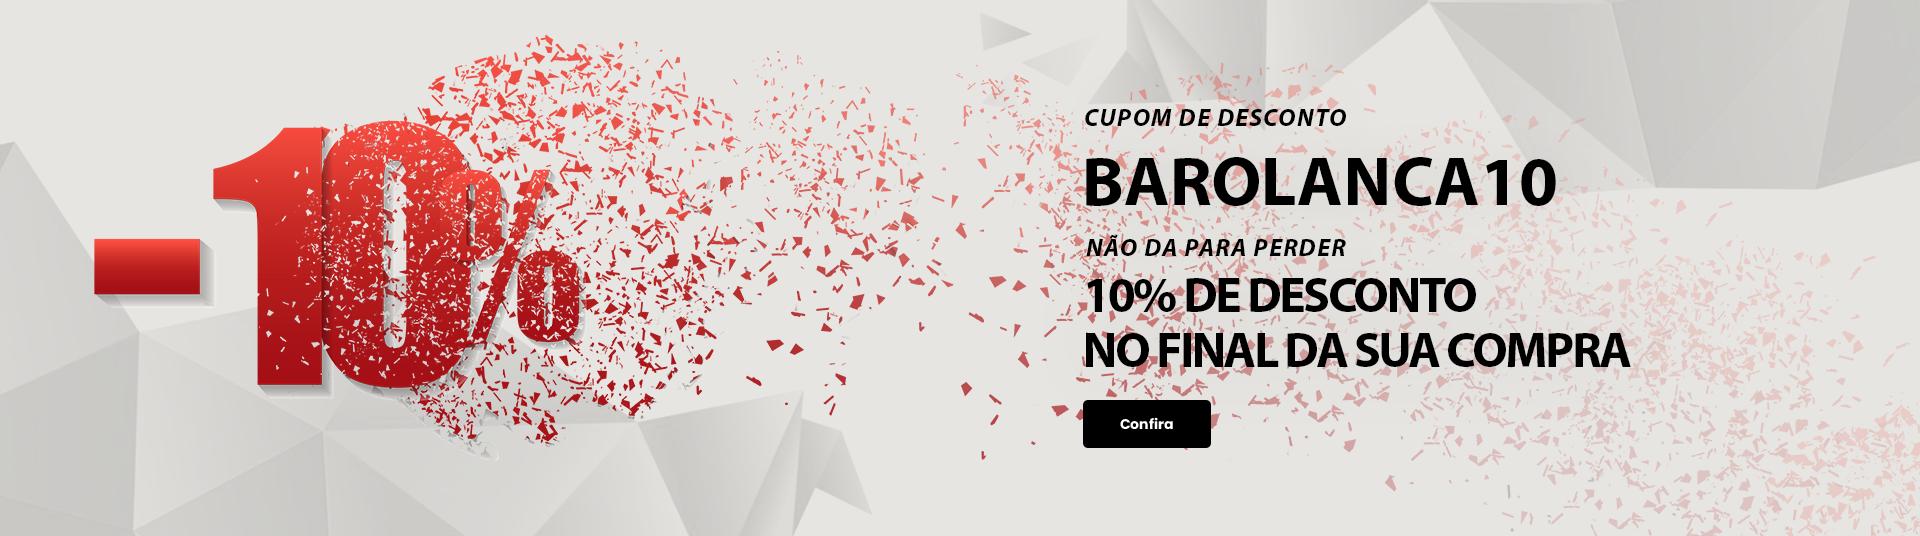 BaroLanca10